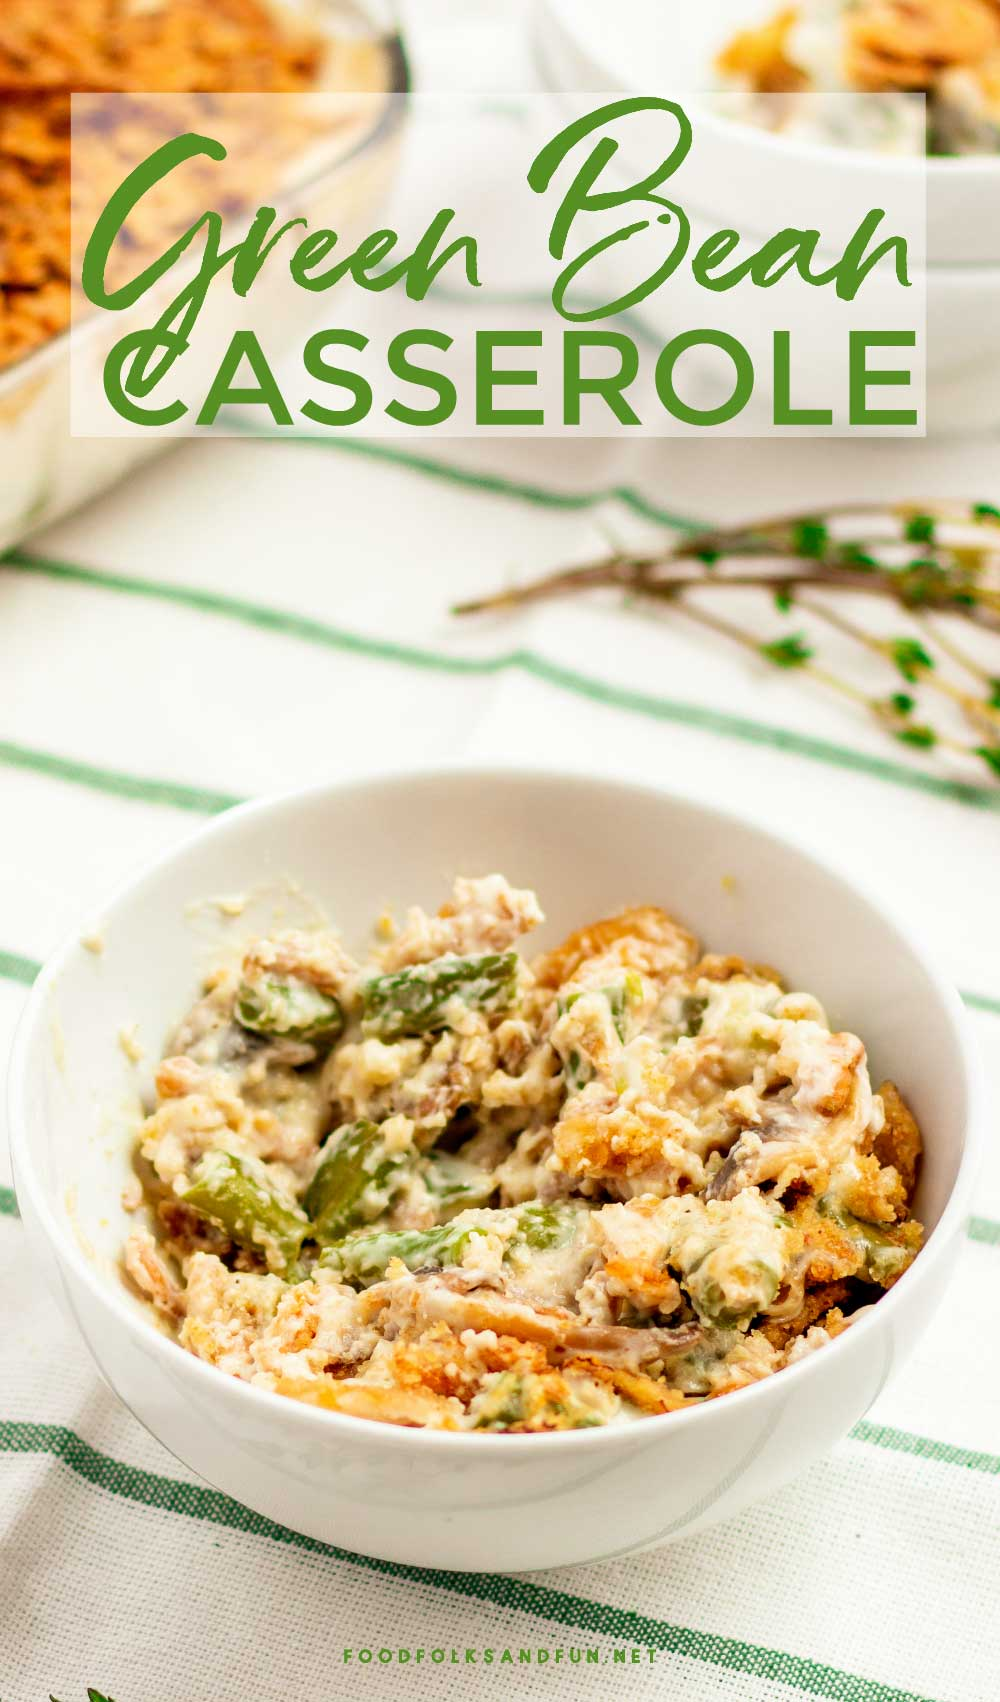 Make Ahead Green Bean Casserole